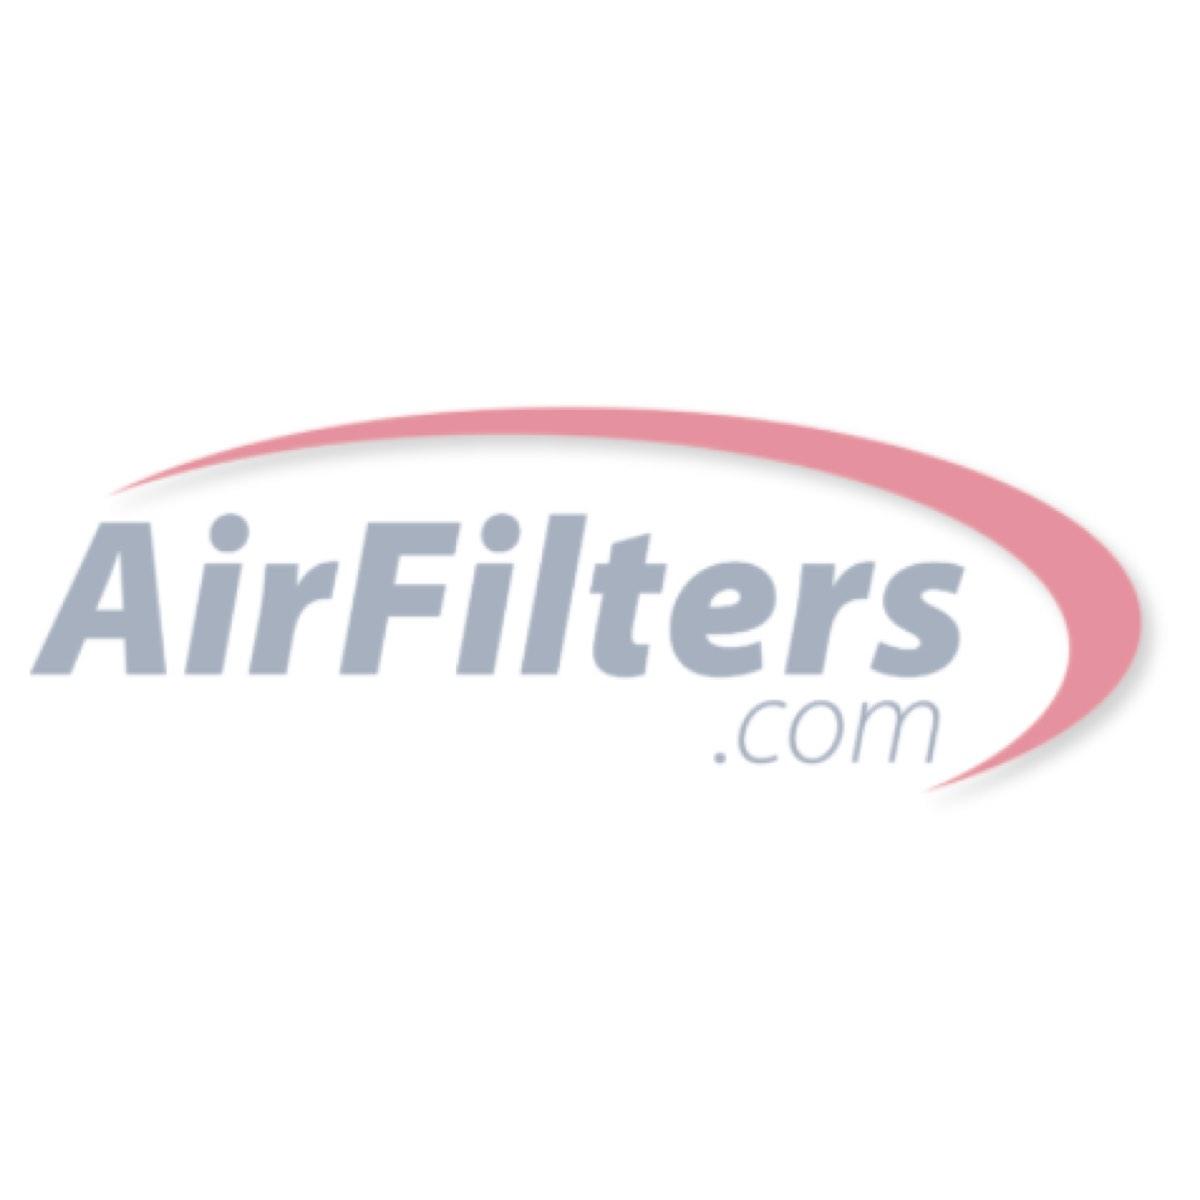 Accumulair Emerald MERV 6 Filters - 4 Inch